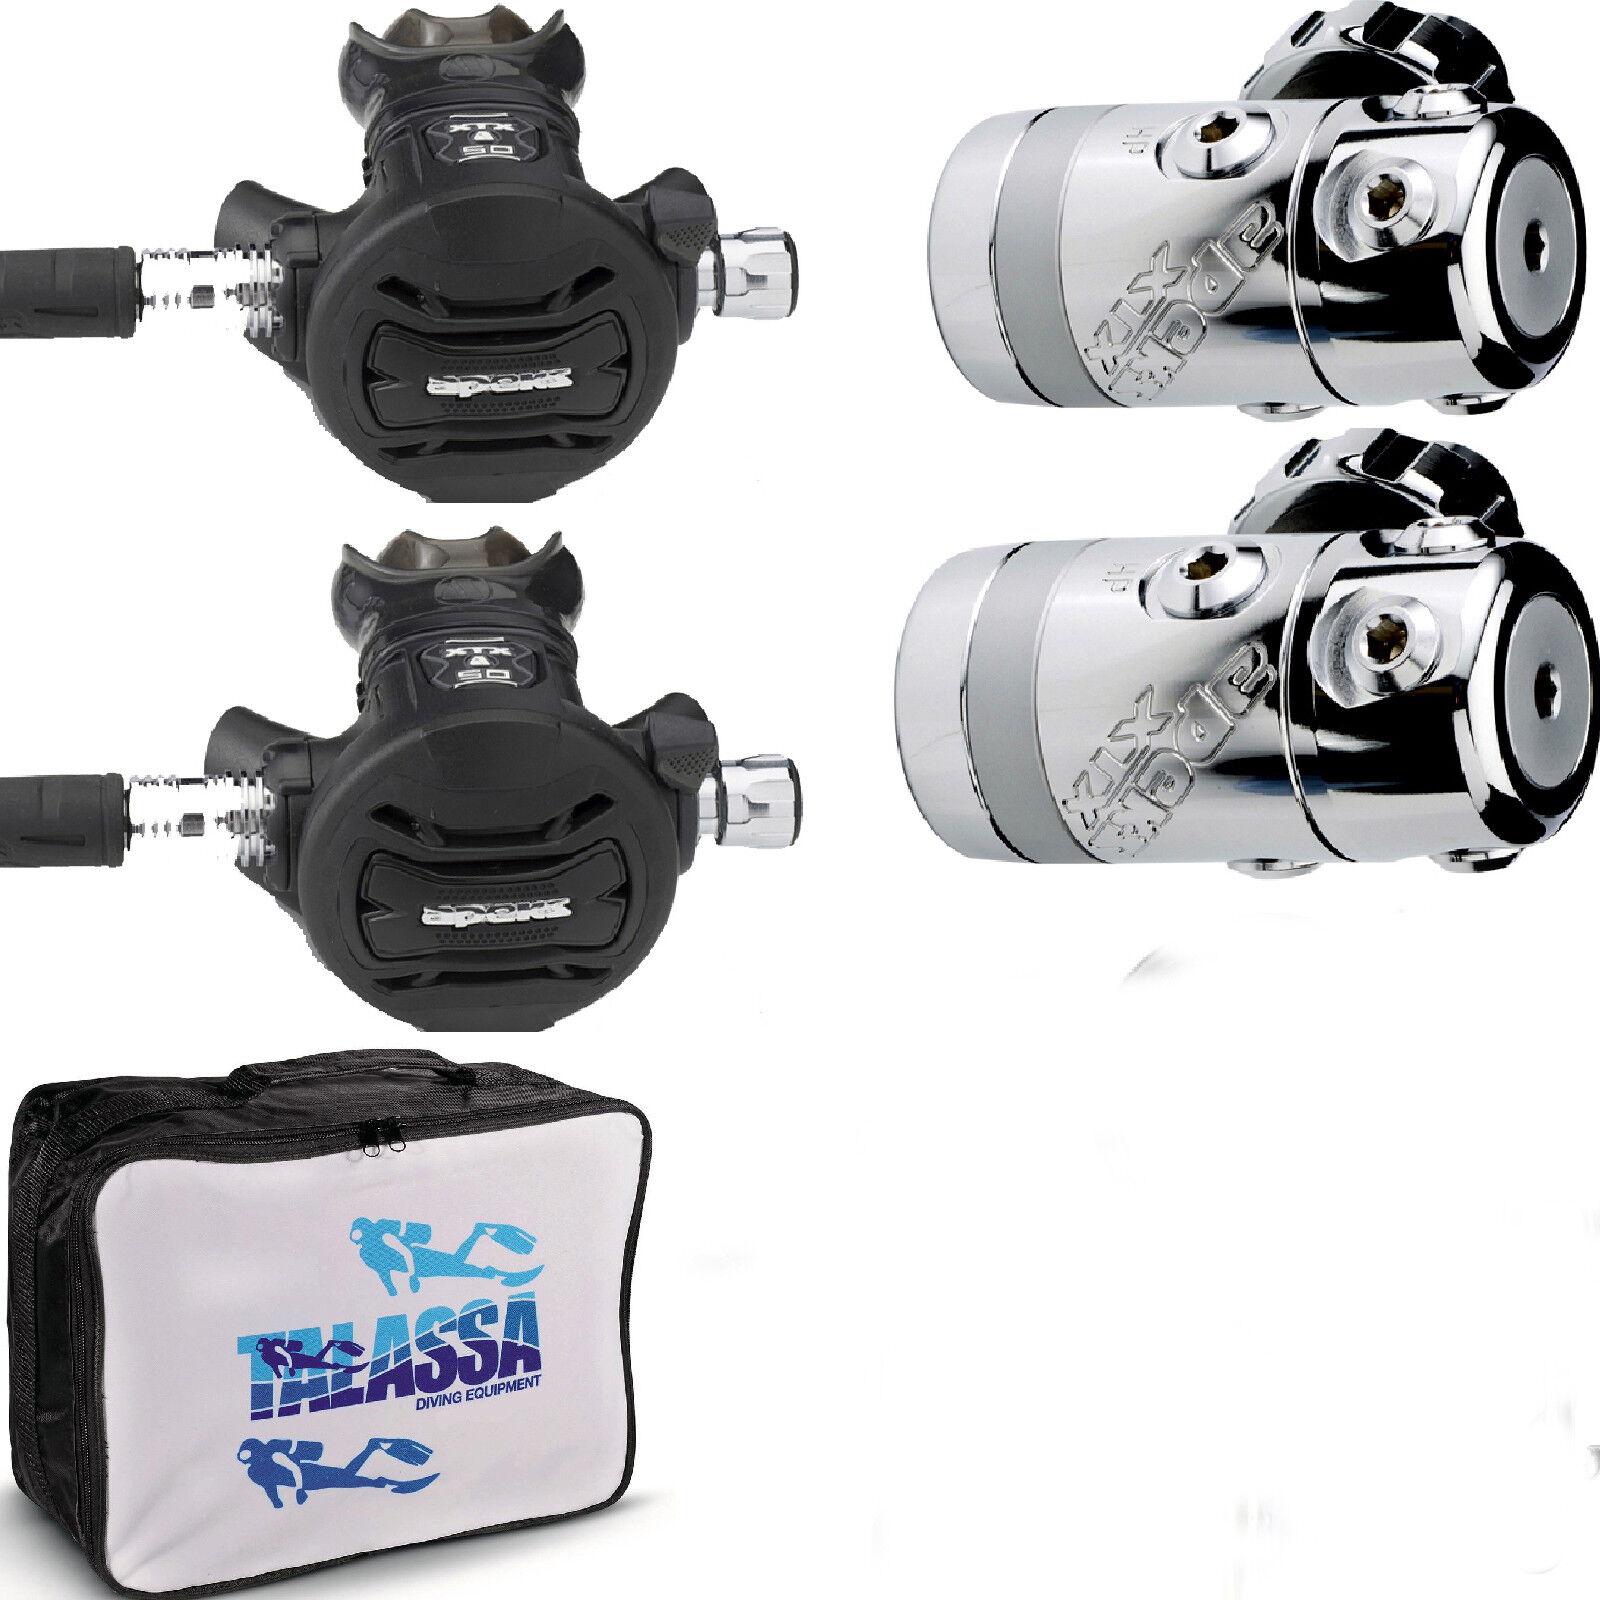 RO1 DIR kit Erogatore Apeks XTX50  e fruste + 5 porta